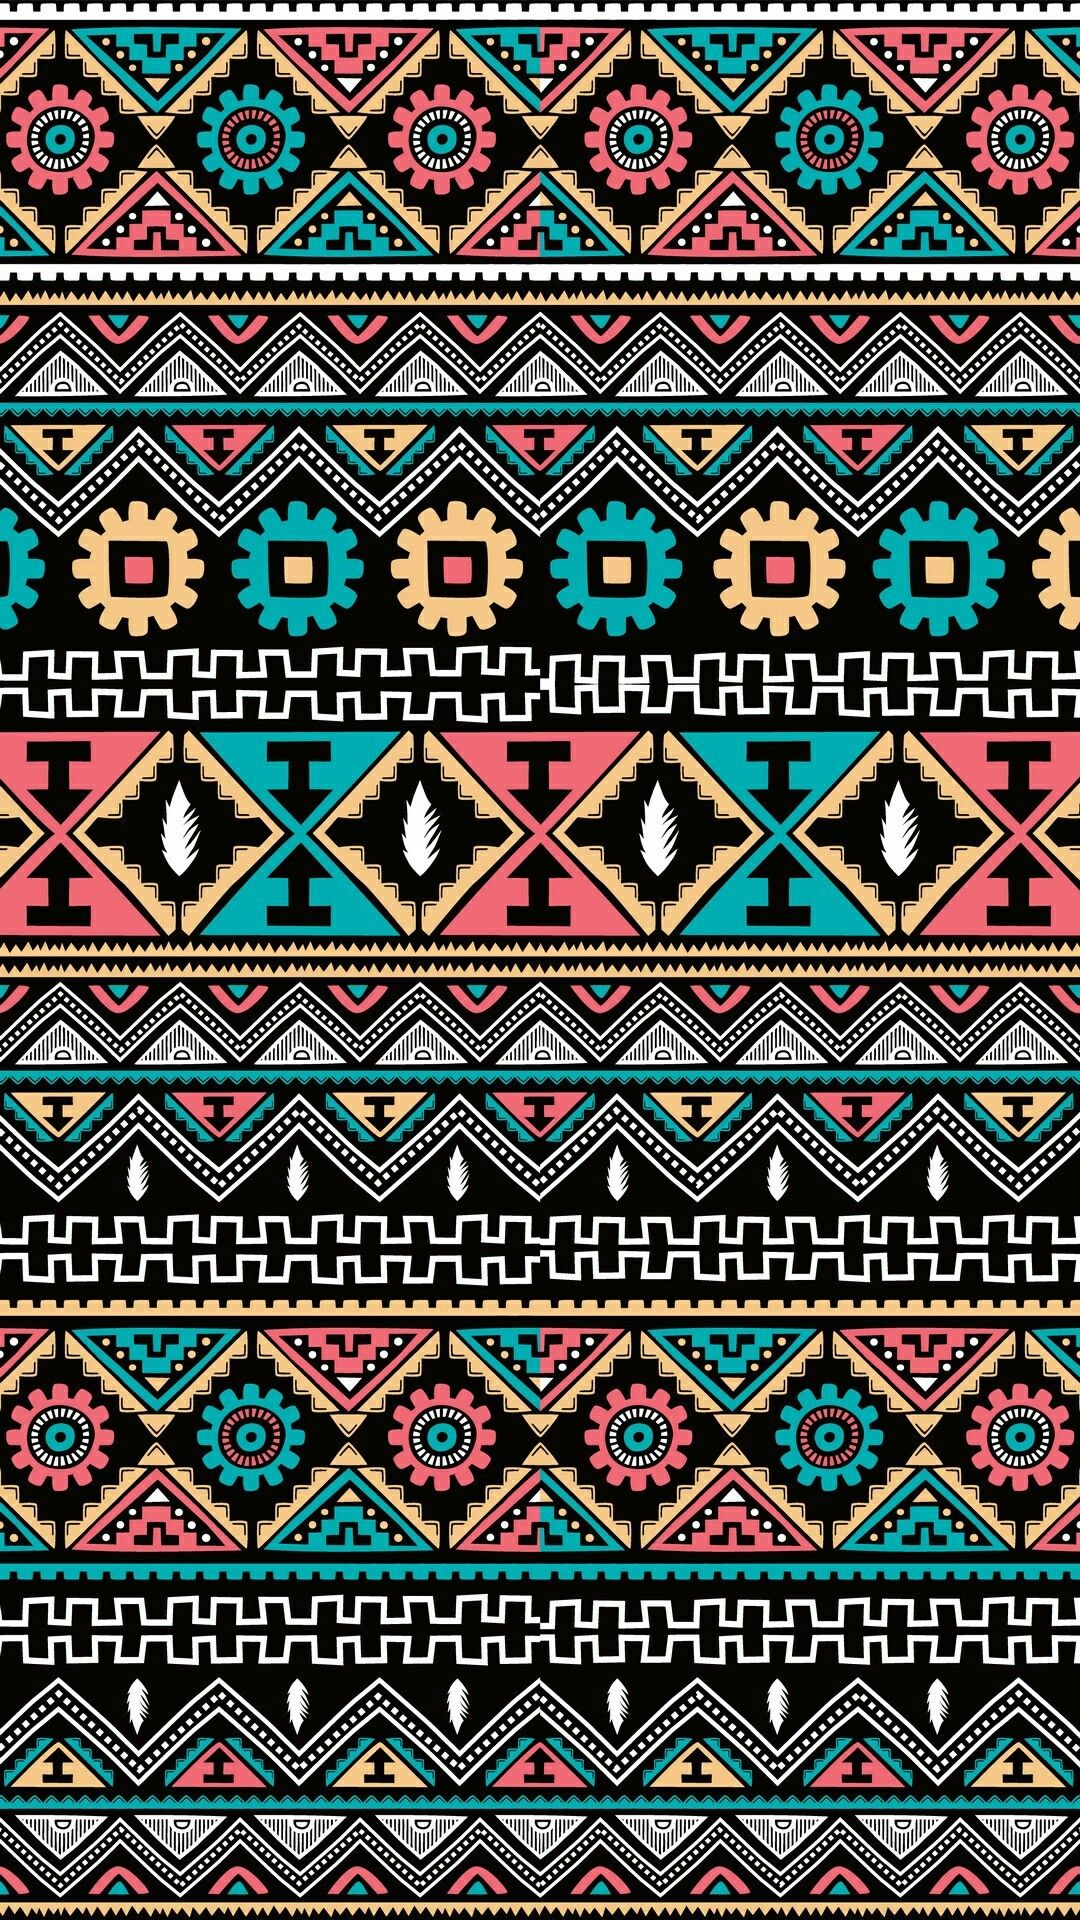 Aztec Phone Wallpapers Top Free Aztec Phone Backgrounds